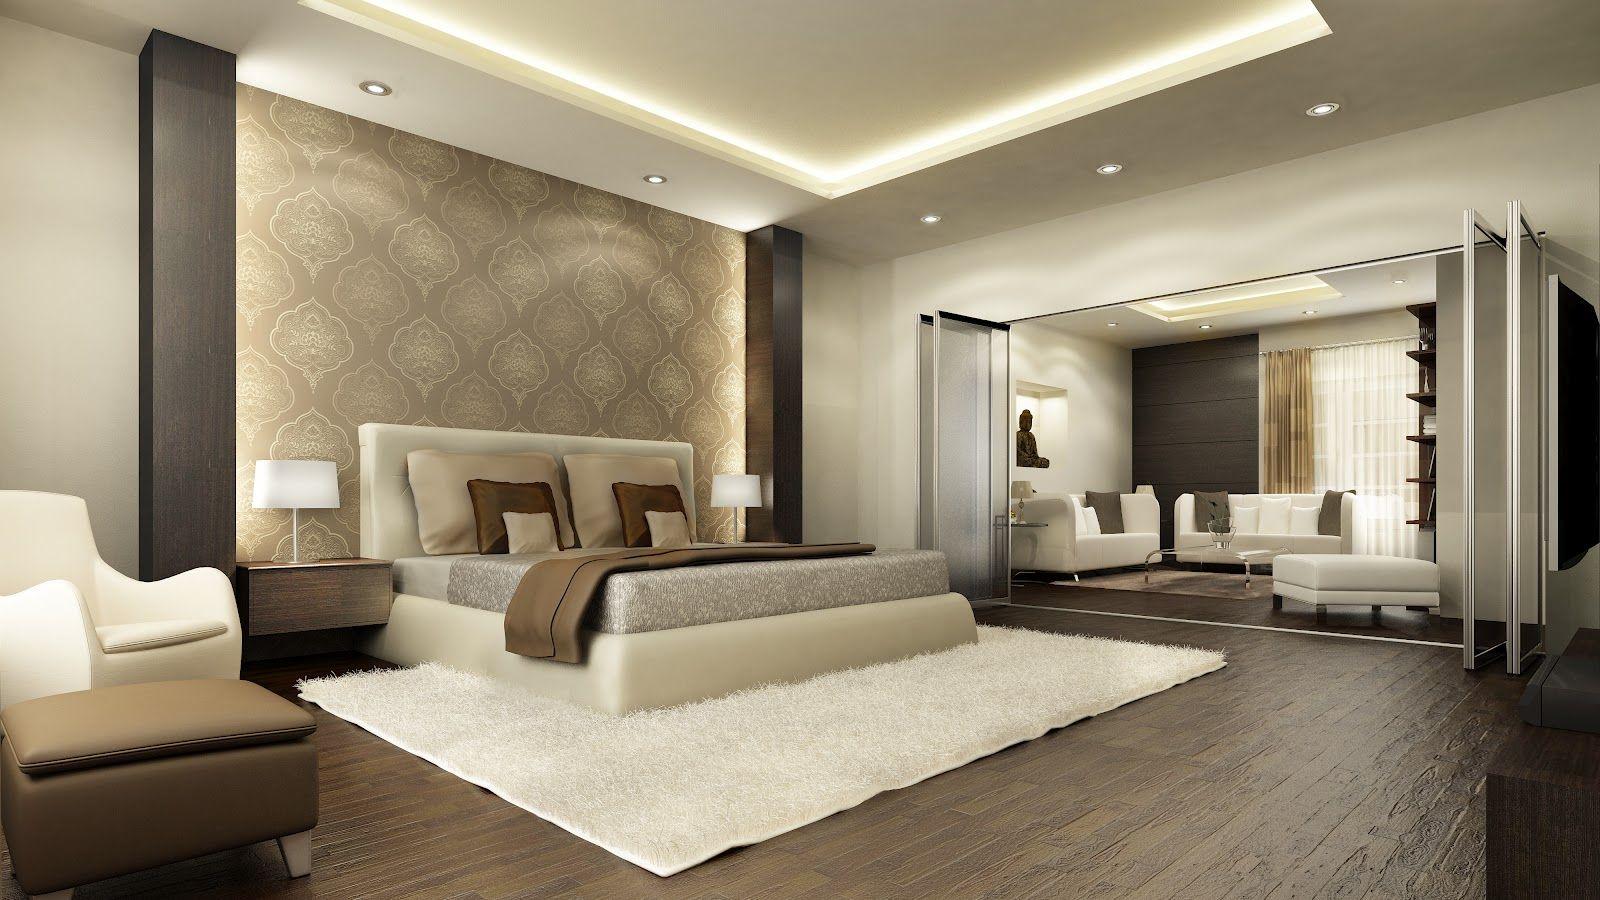 Floor and ceilingmasterbedroominteriordesign110jpg 1600 floor and ceilingmasterbedroominteriordesign110jpg 1600 bedroom ideas